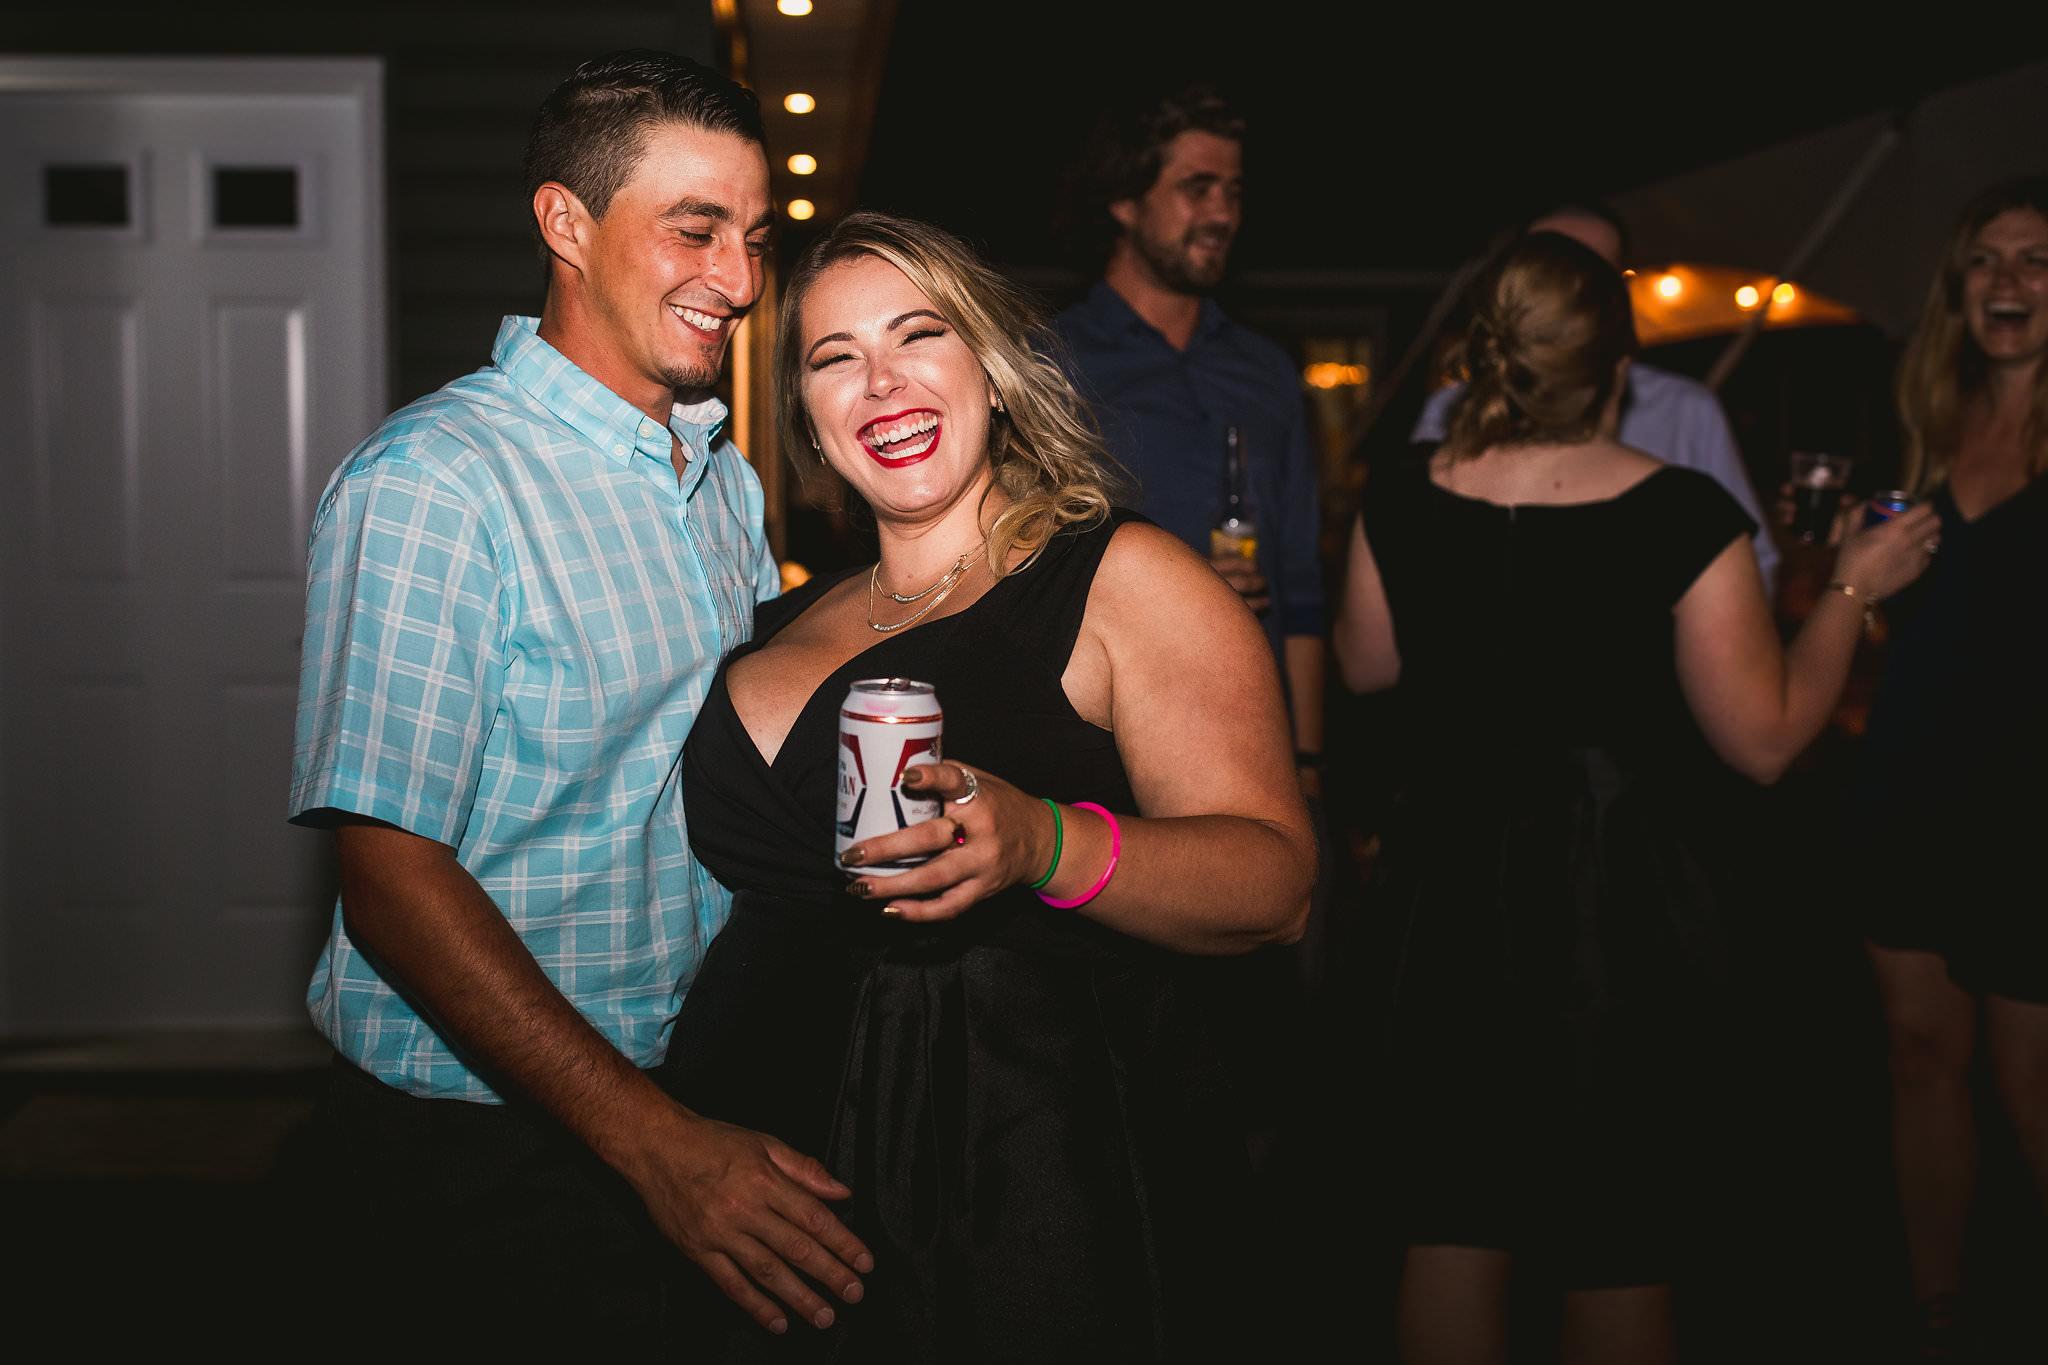 Kristen Adam Kindred Loft Whitby Wedding Photos 631 - Durham Wedding Photographer: Kindred Loft Wedding Photos